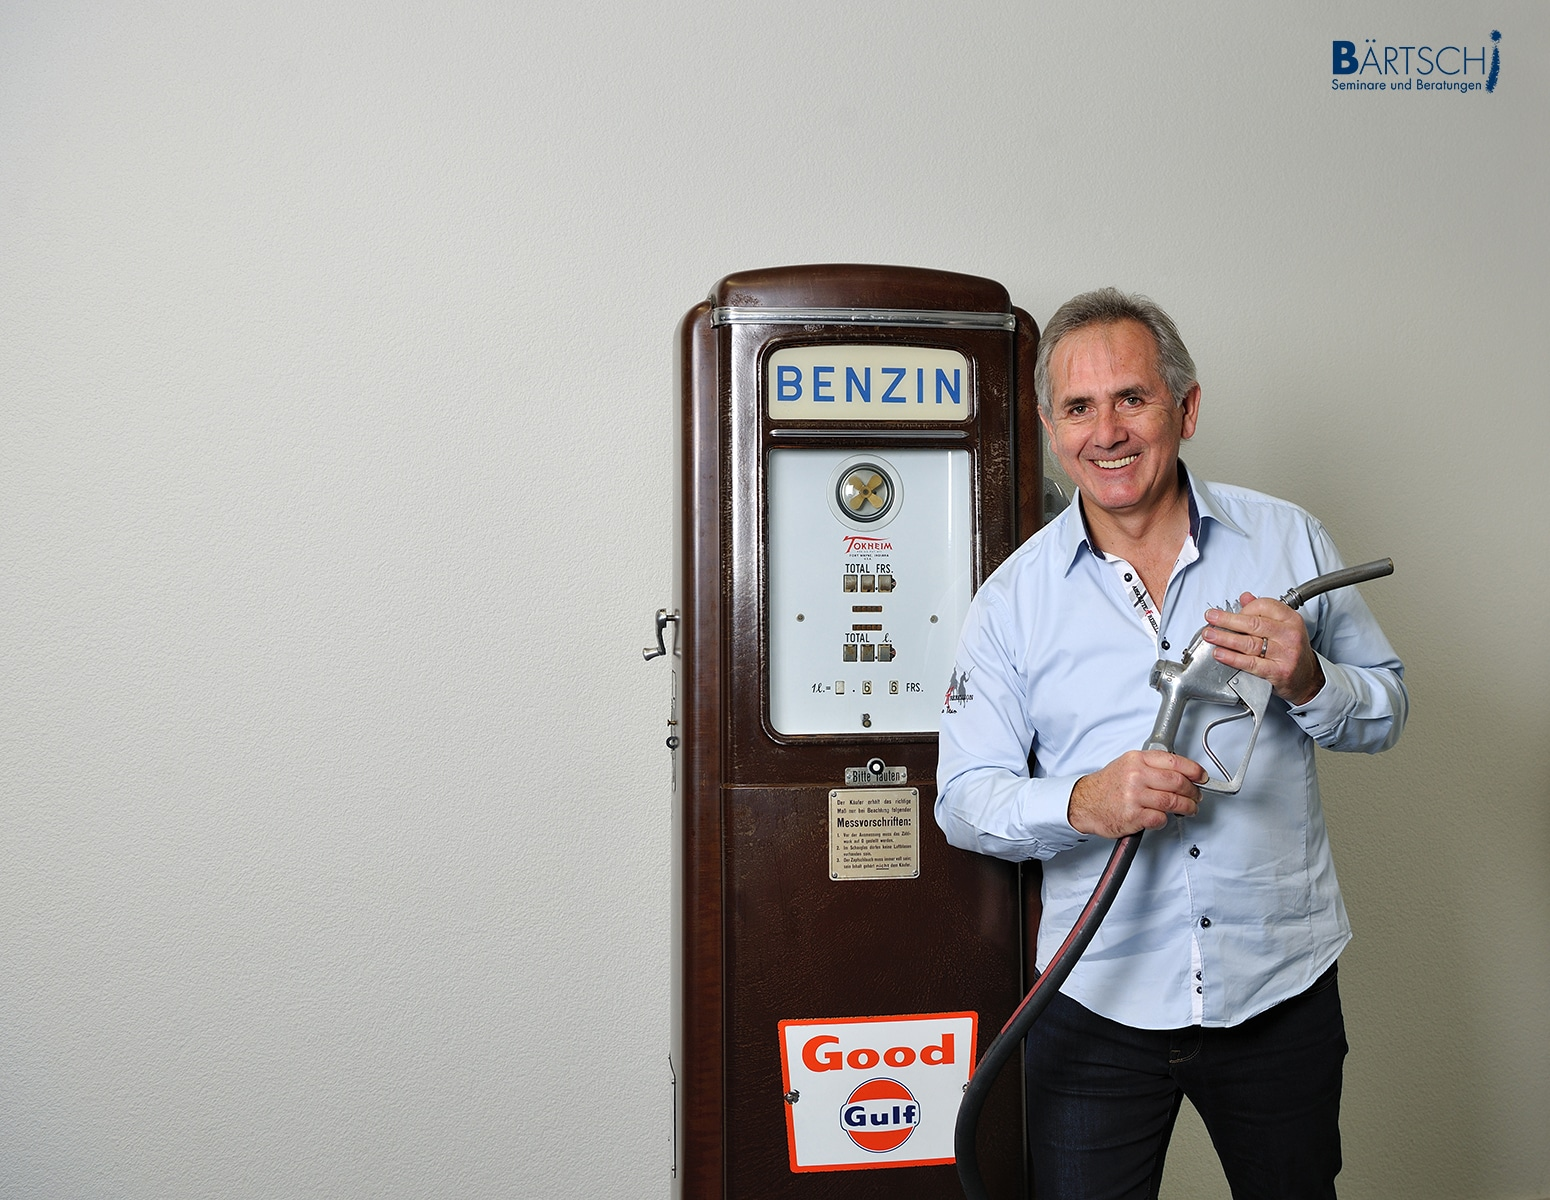 Urs R. Bärtschi - Coachingexperte - Coachingplus